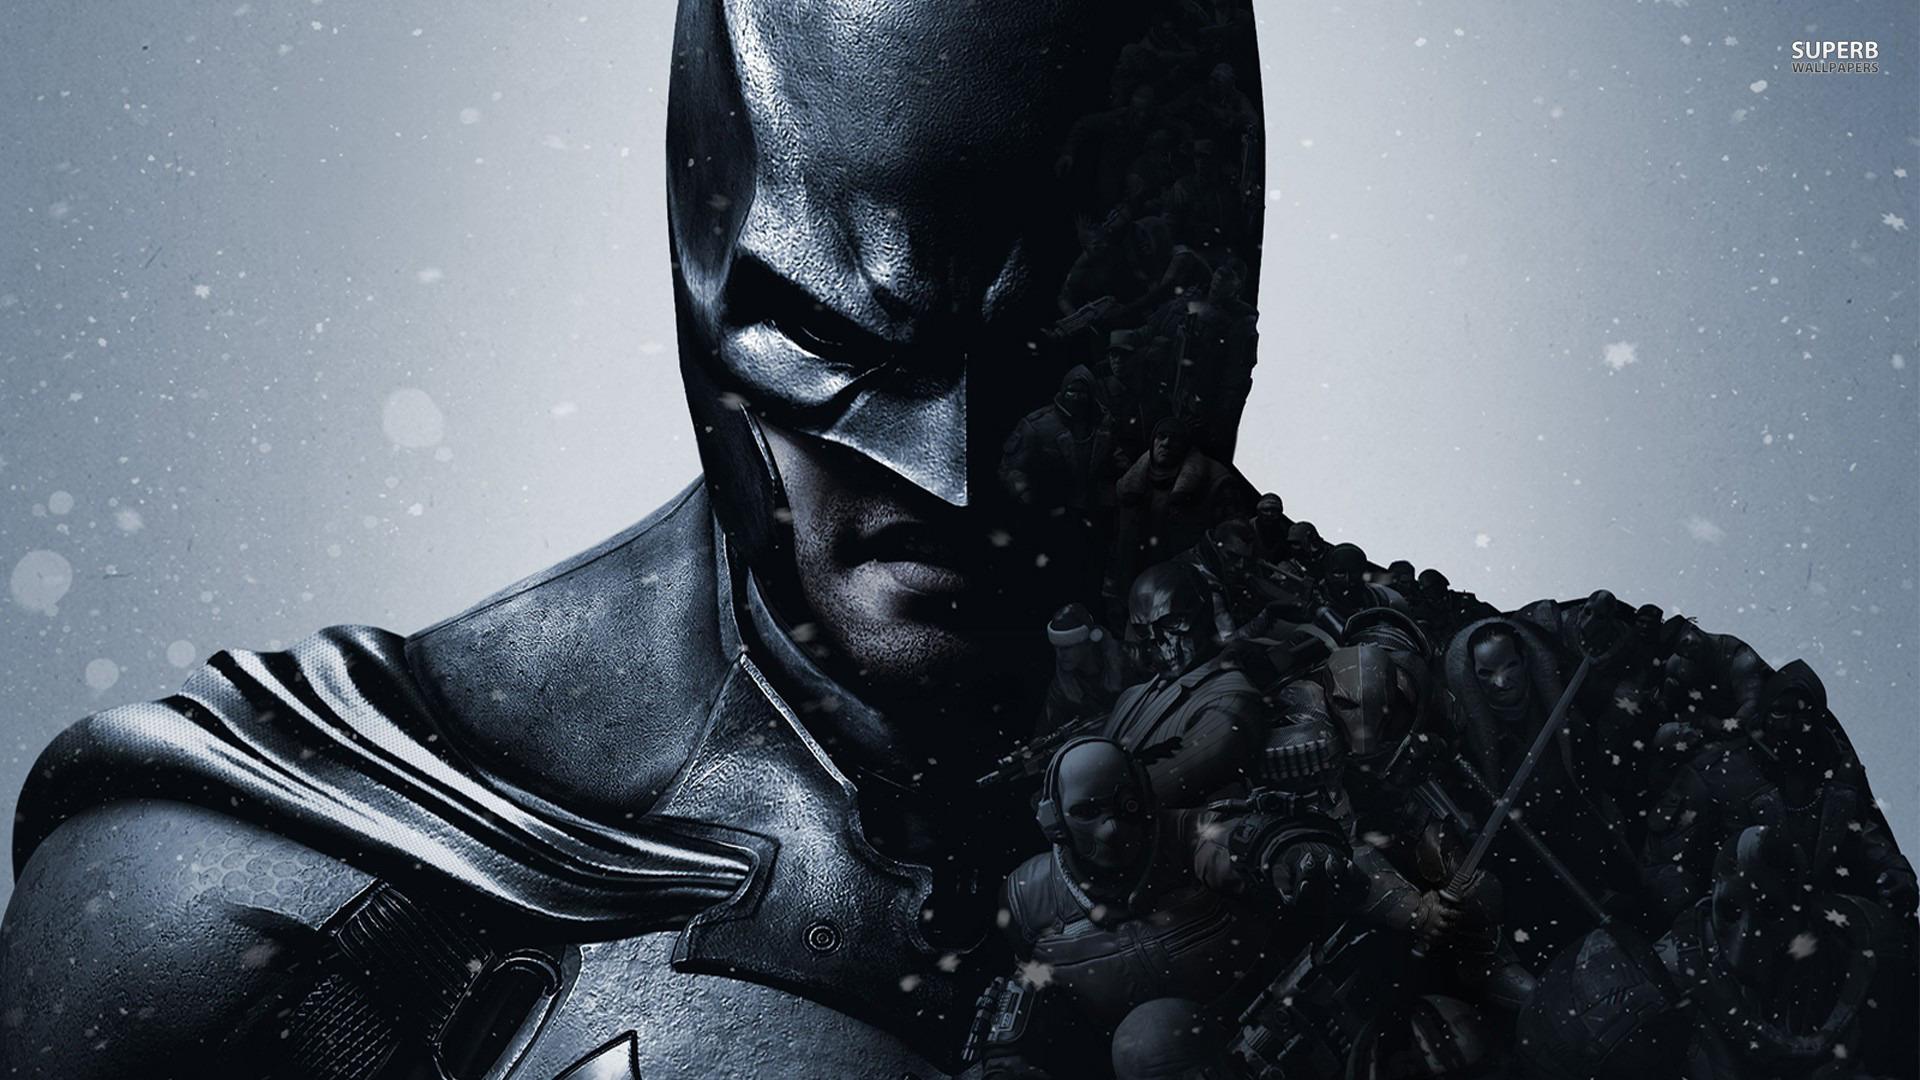 batman-arkham-origins-21126-1920x1080.jpg